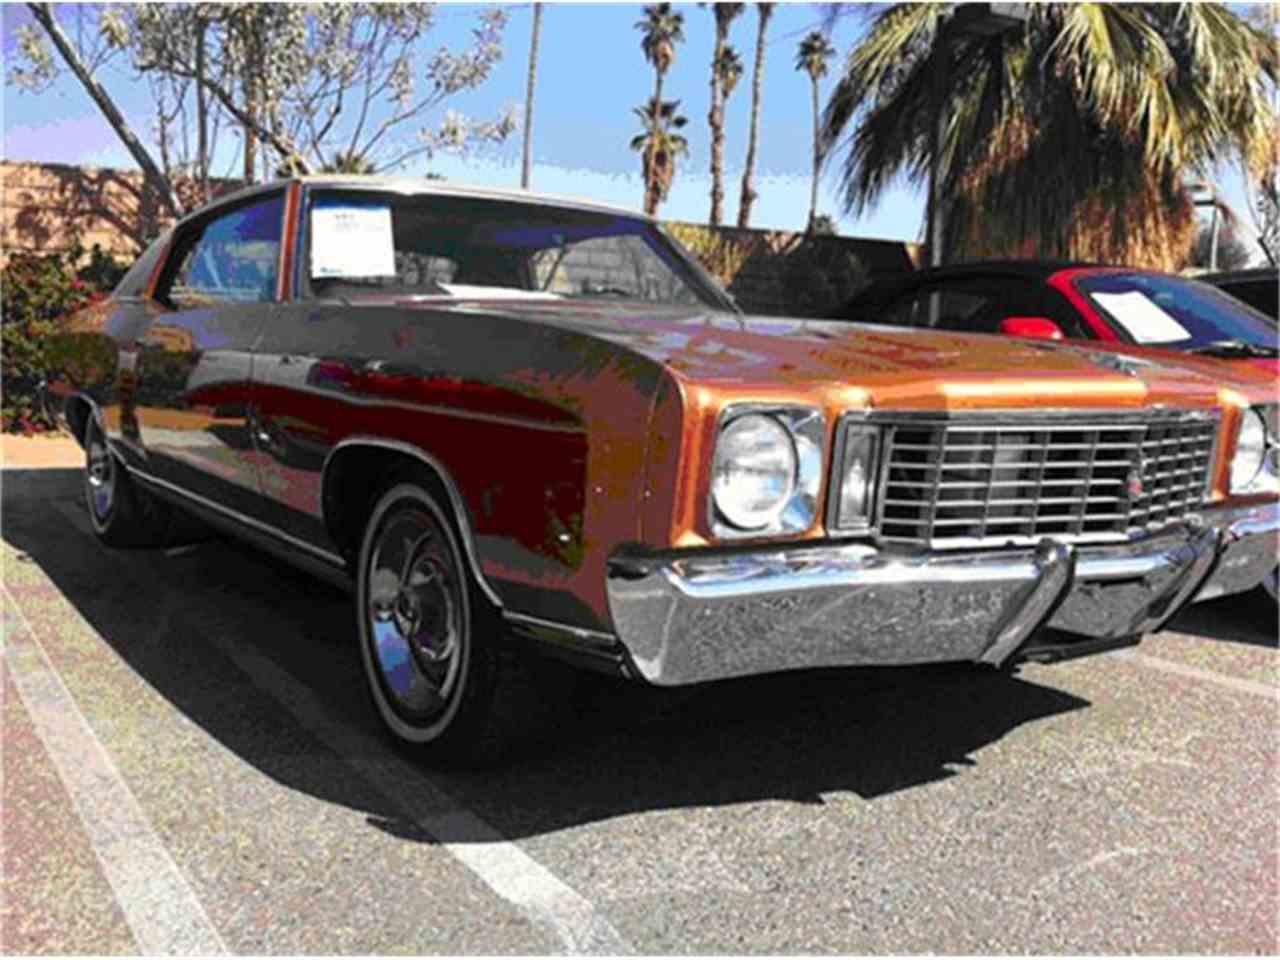 Best Used Cars Under 5000 Edmonton: 1972 Chevrolet Monte Carlo For Sale